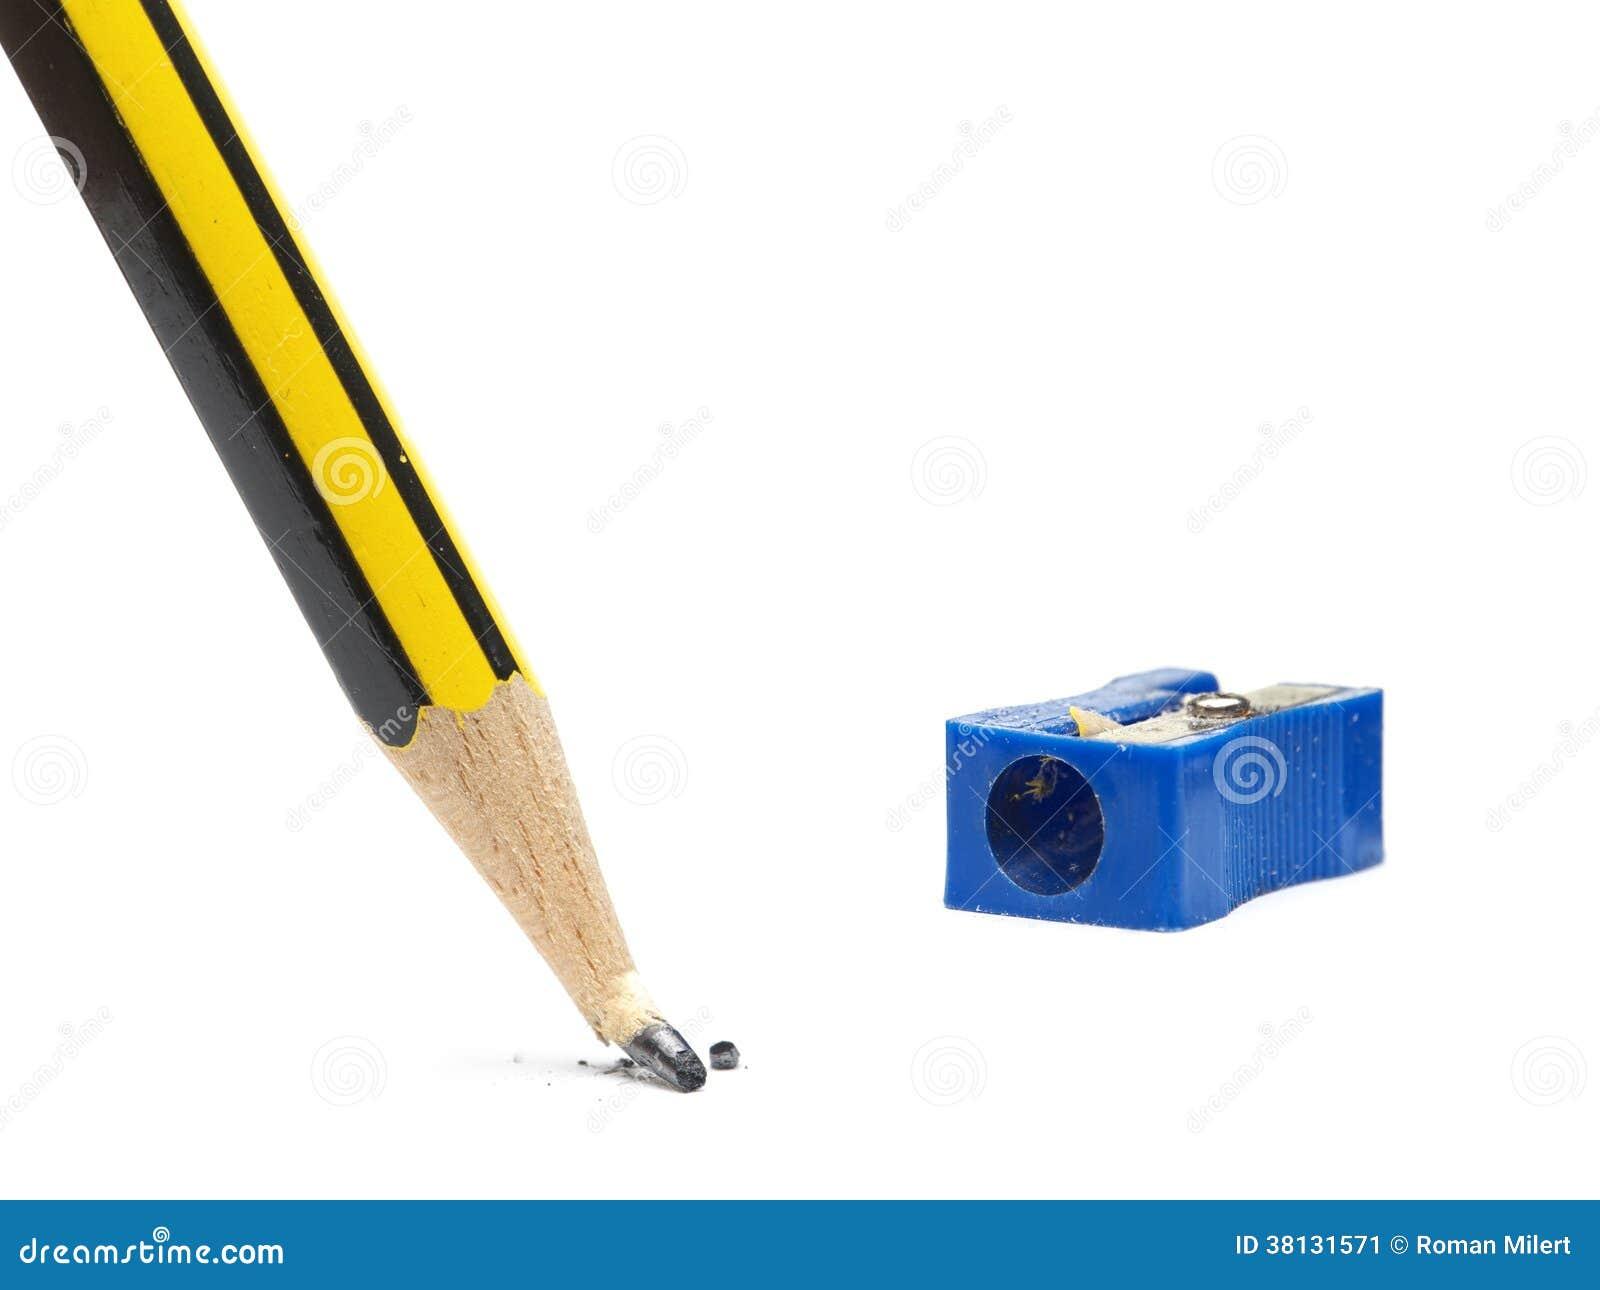 Broken pencil tip stock image. Image of drawing, white ...